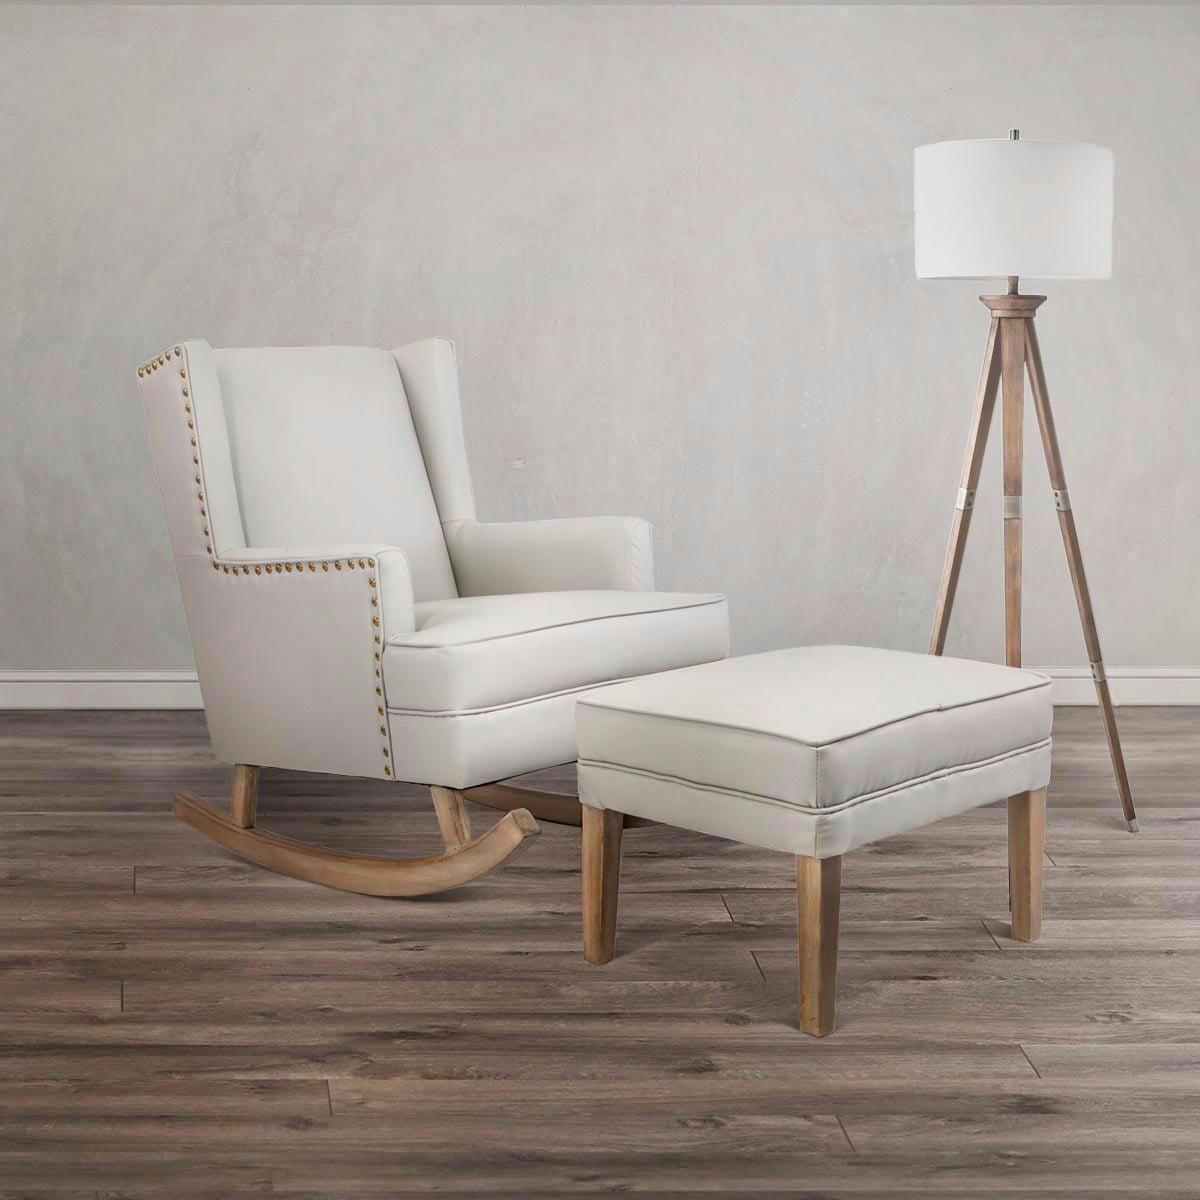 Barton Leather Rocking Chair Glider & Ottoman Set with Cushion, Beige by BARTON